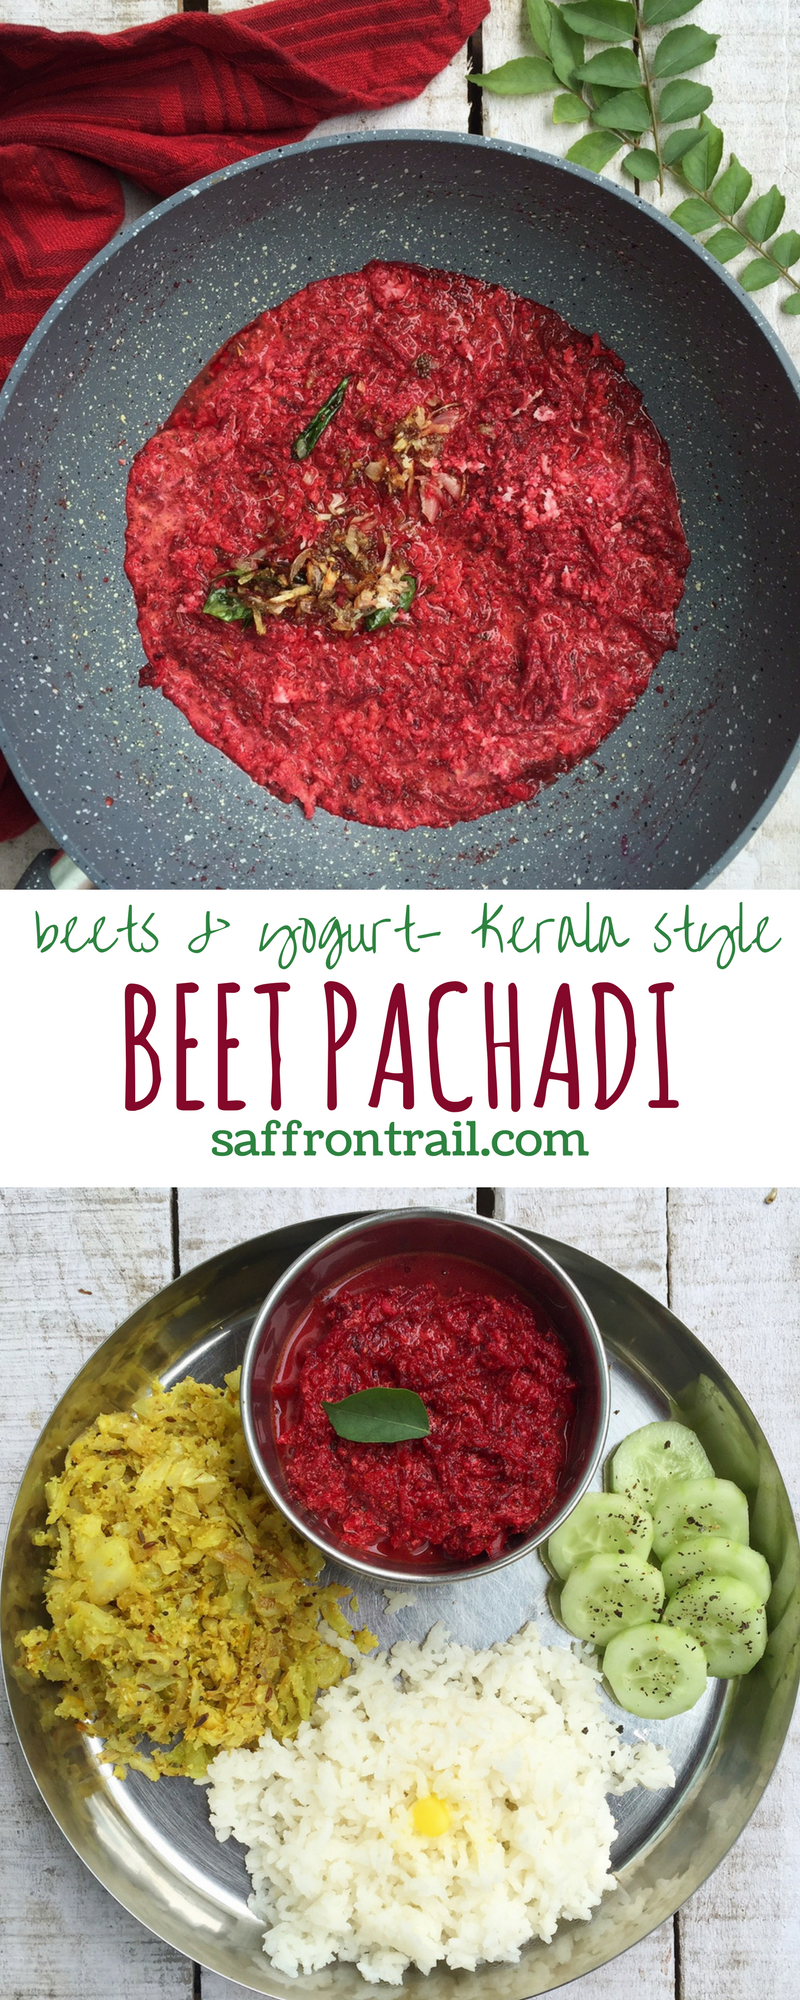 Beetroot pachadi recipe kerala beetroot and recipes beetroot pachadi recipes for beetsbeetroot recipesvegan recipeskerala foodcurry forumfinder Images